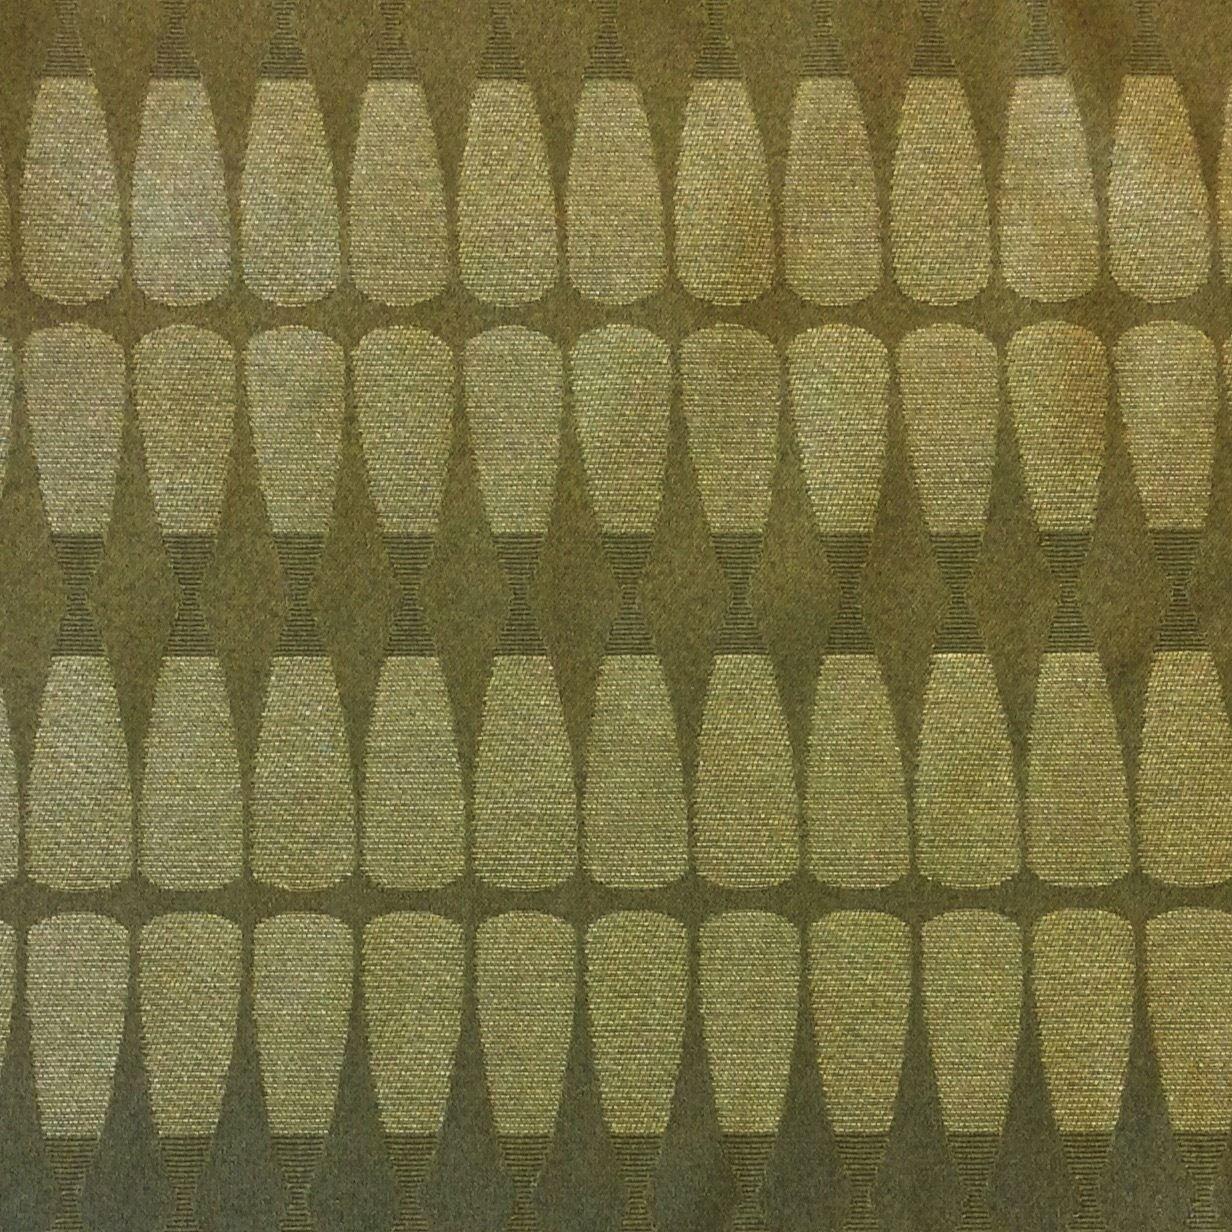 Maharam Retro Modern Olive Green Diamond Jacquard Design Cotton